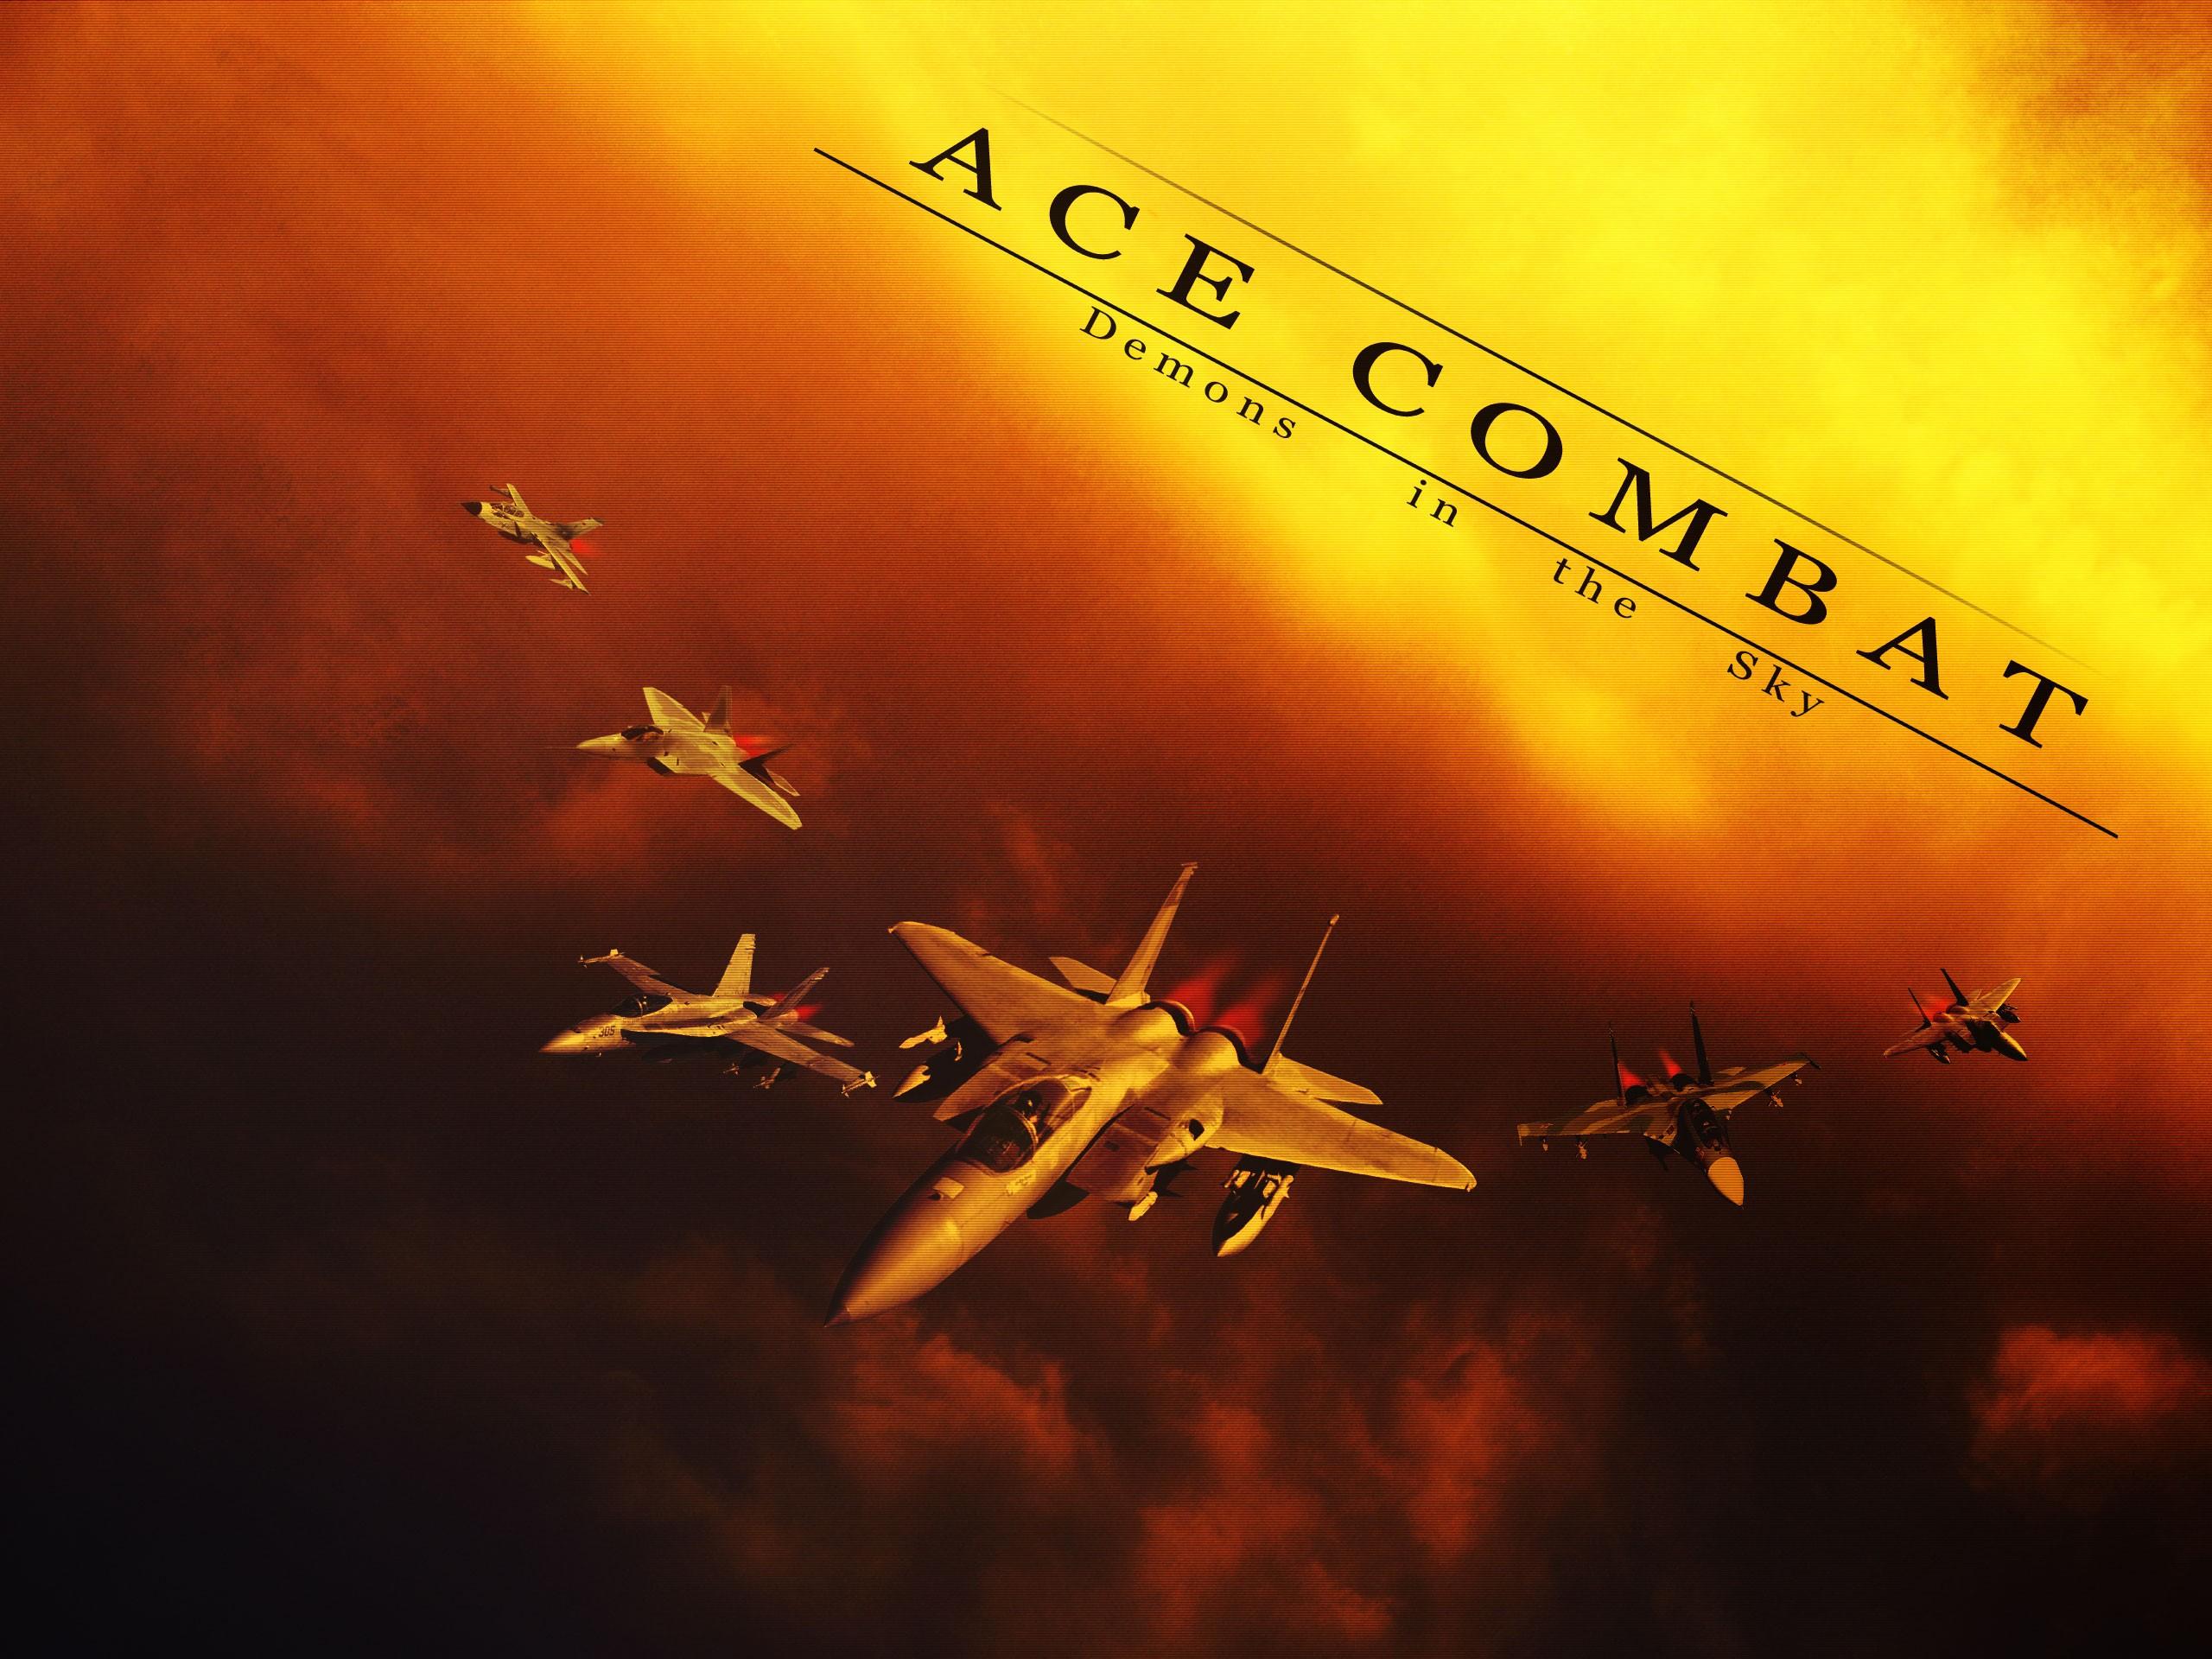 Ace Combat Wallpaper 2560x1920 Ace Combat 2560x1920